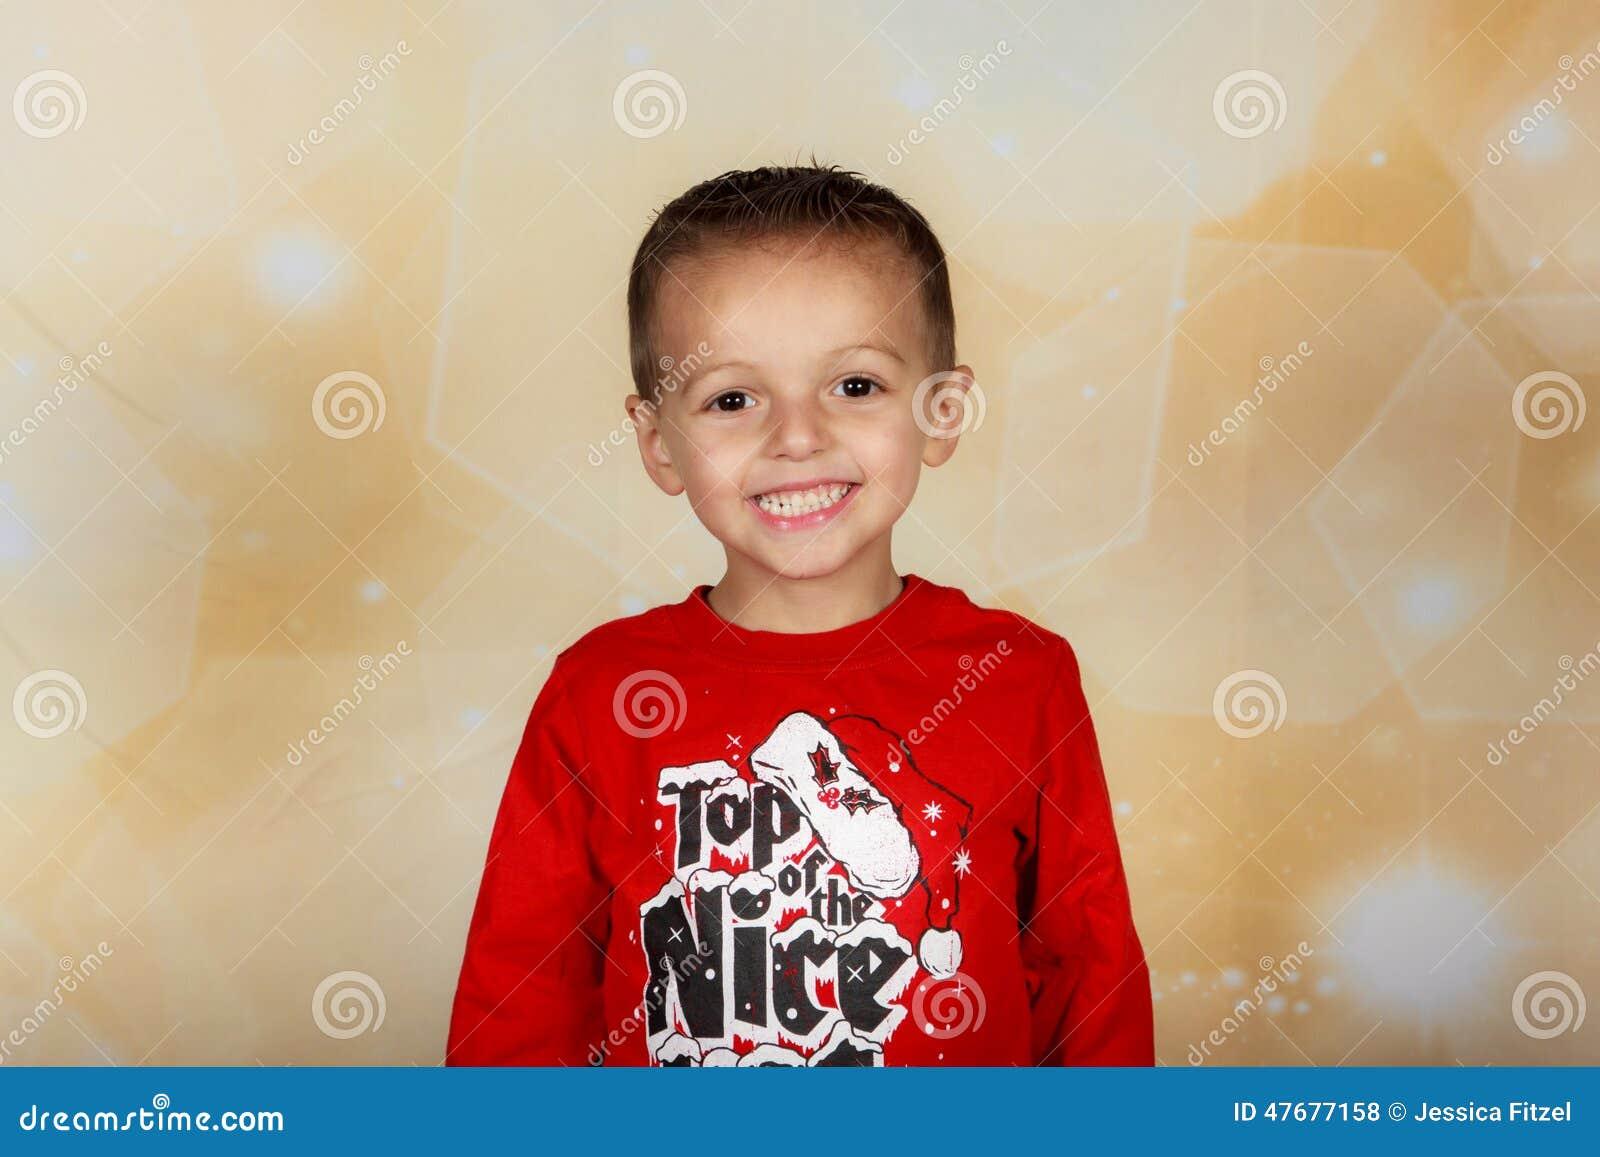 Smiling holiday boy